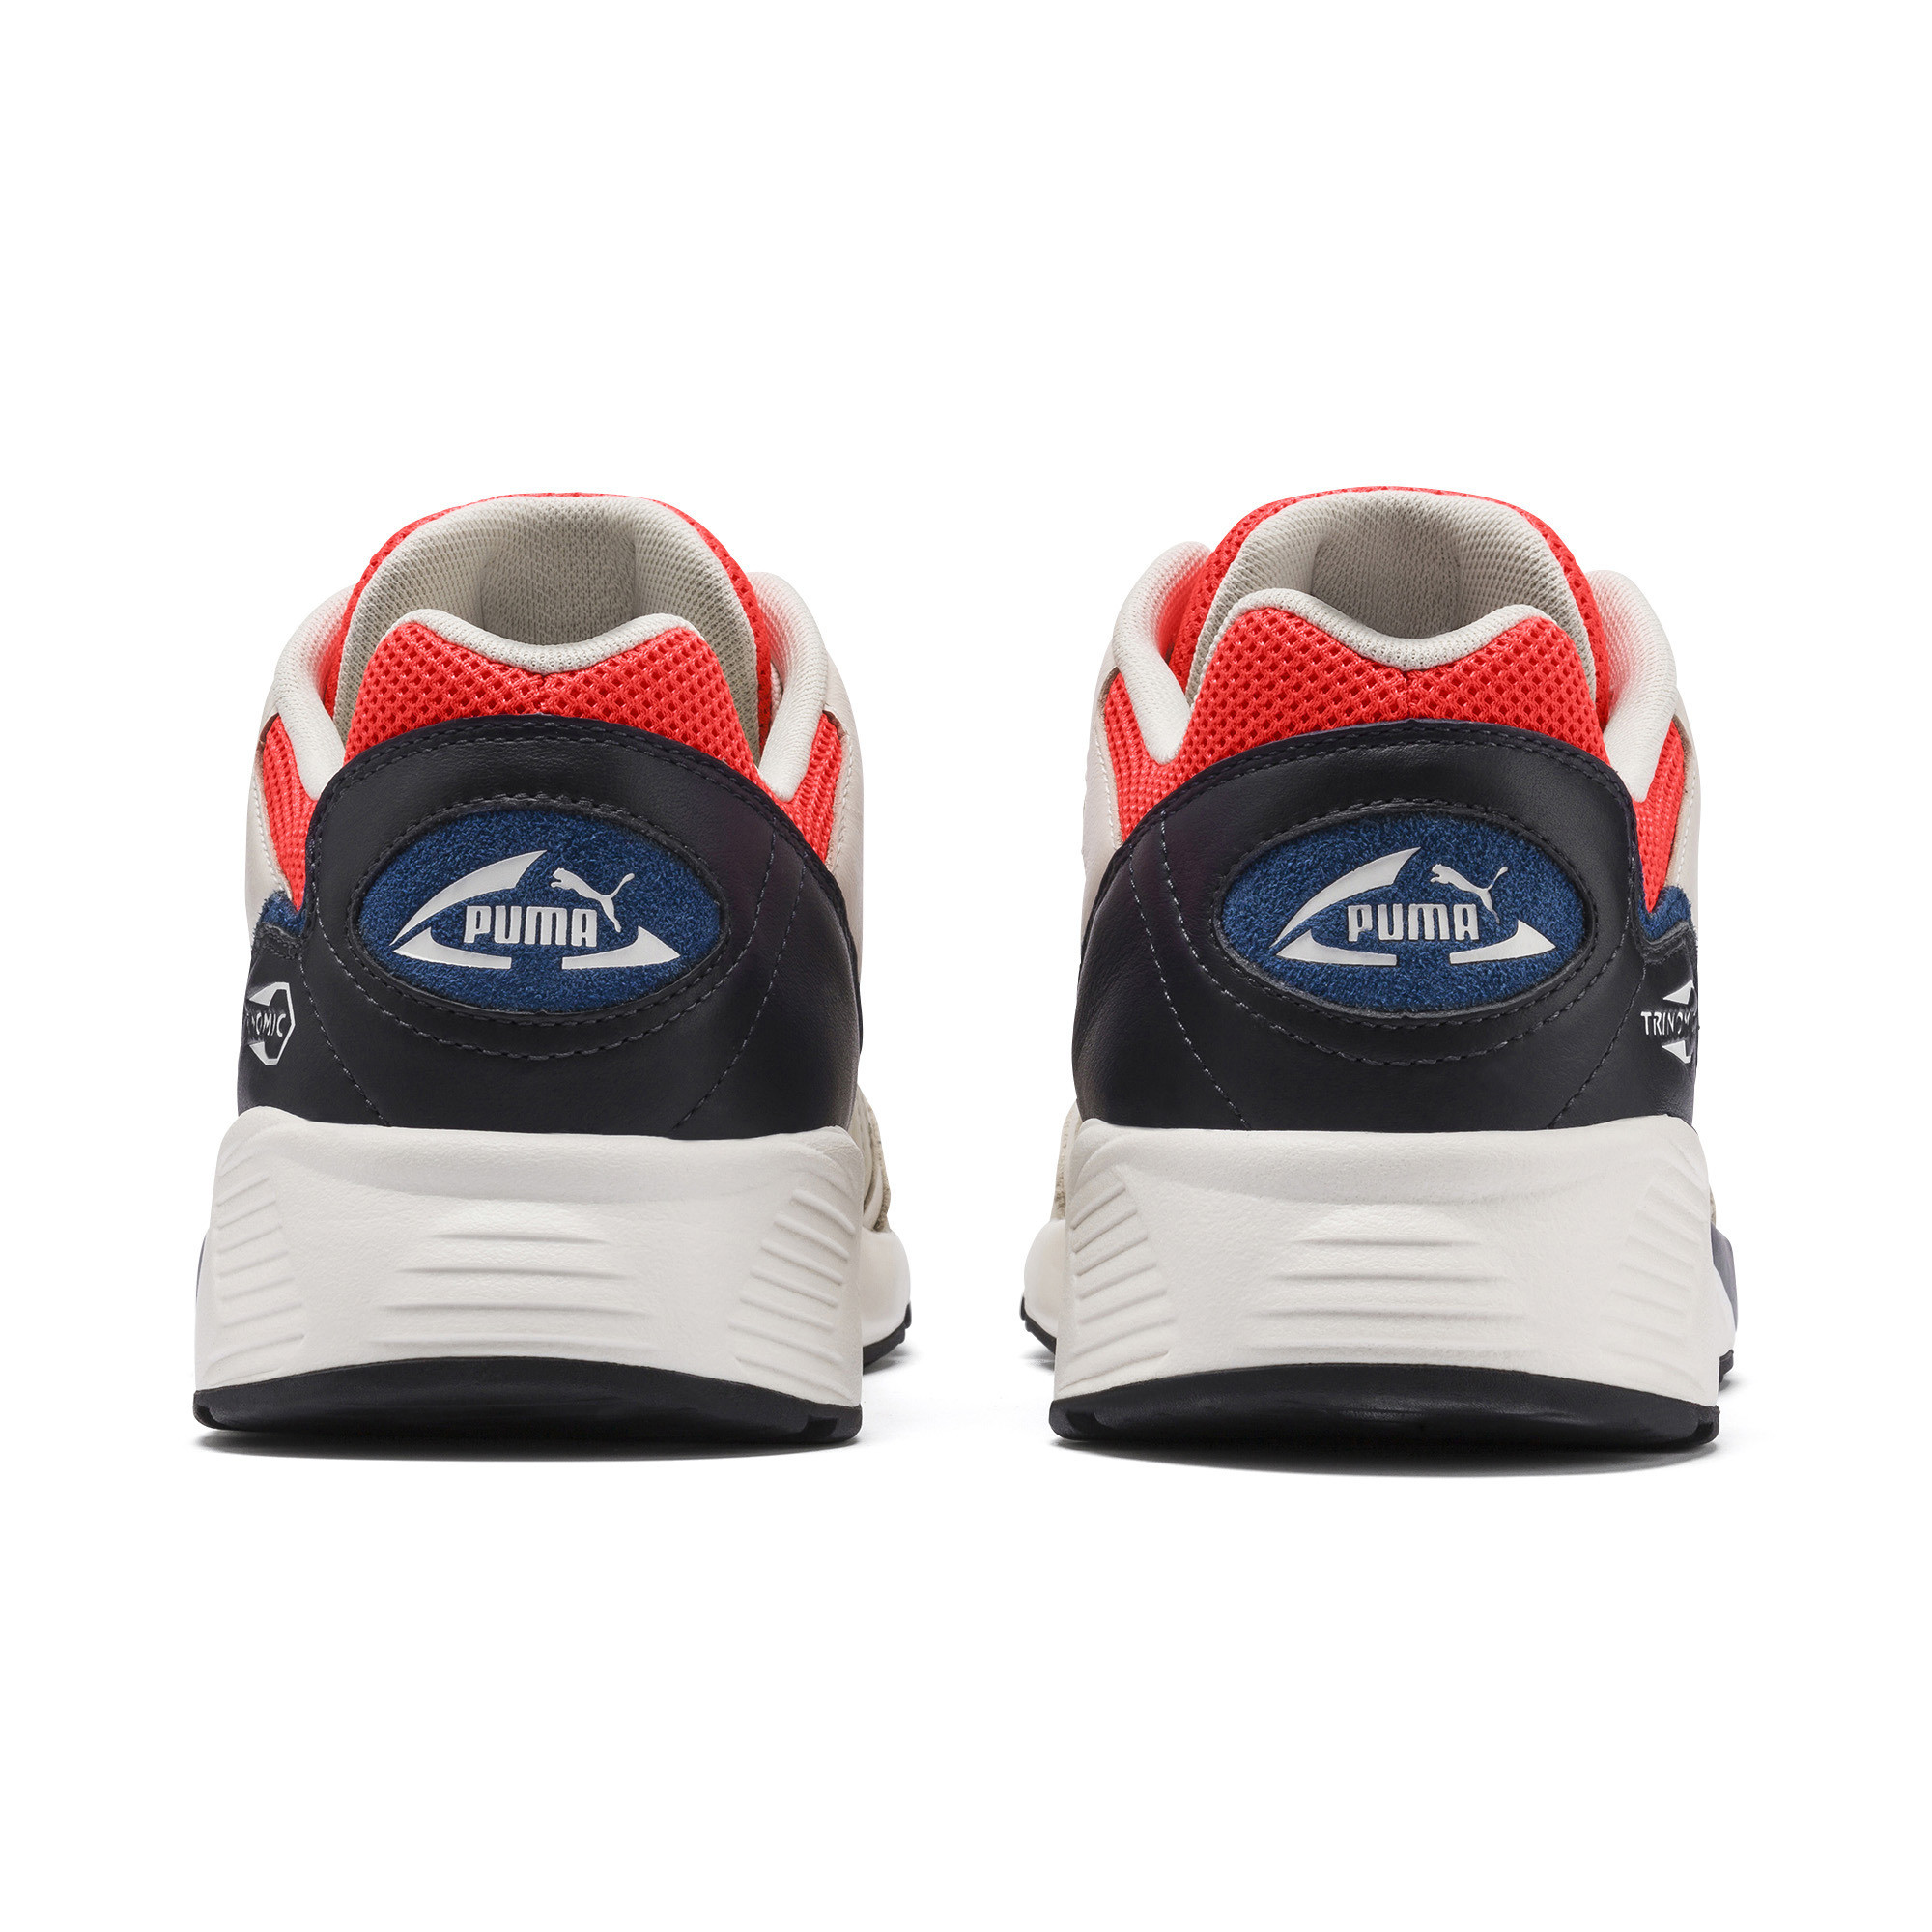 PUMA-Prevail-Classic-Sneakers-Unisex-Shoe thumbnail 3